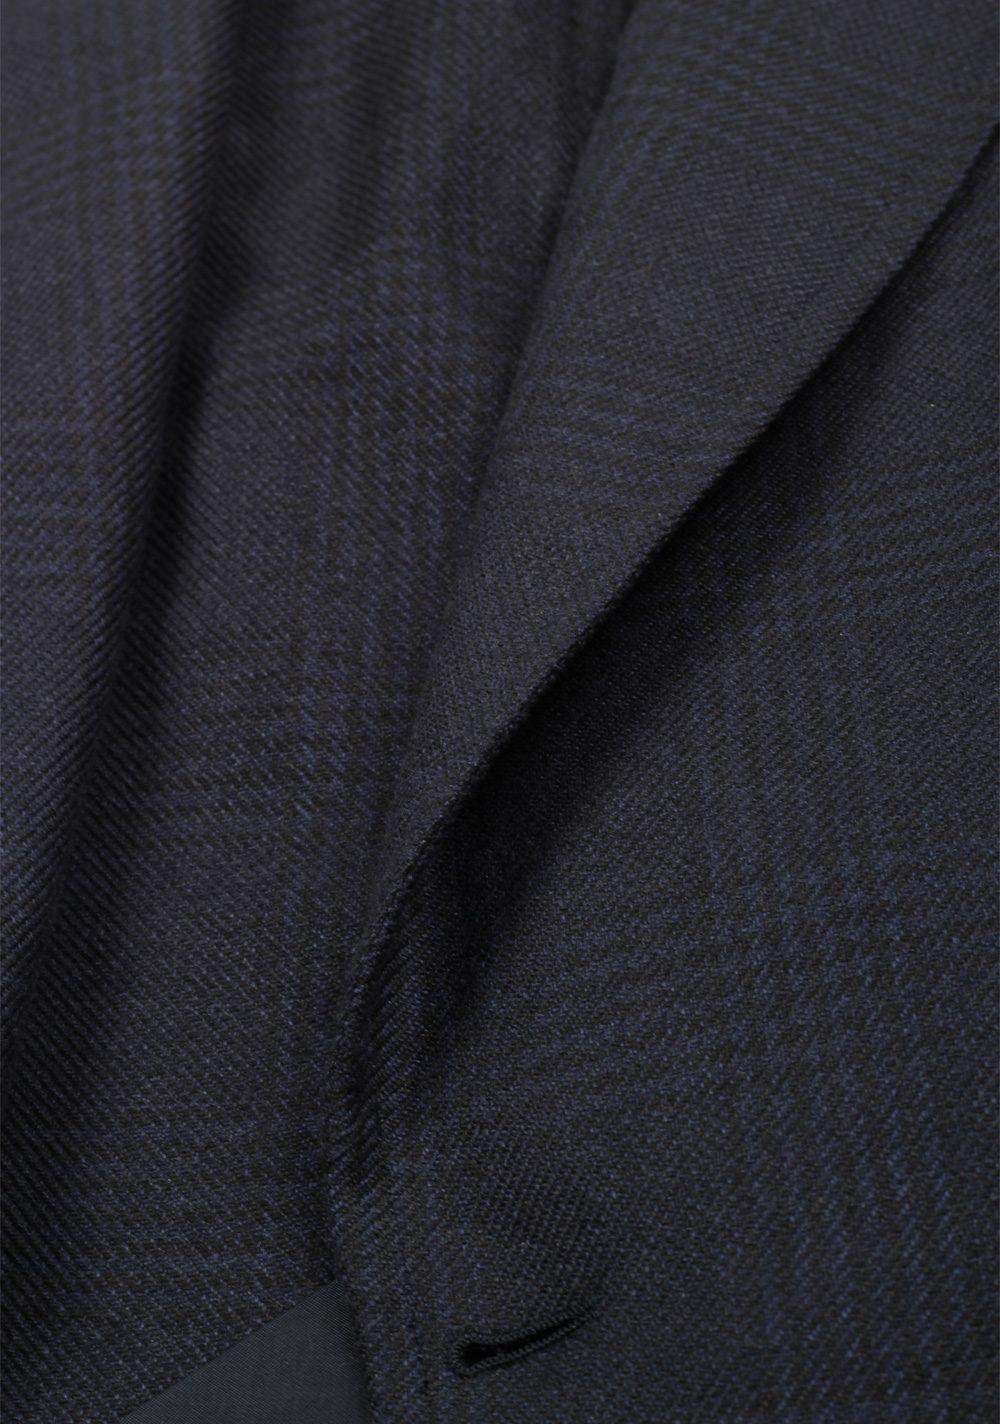 TOM FORD Shelton Blue Checked Sport Coat Size 48L / 38L U.S. Silk Cashmere | Costume Limité